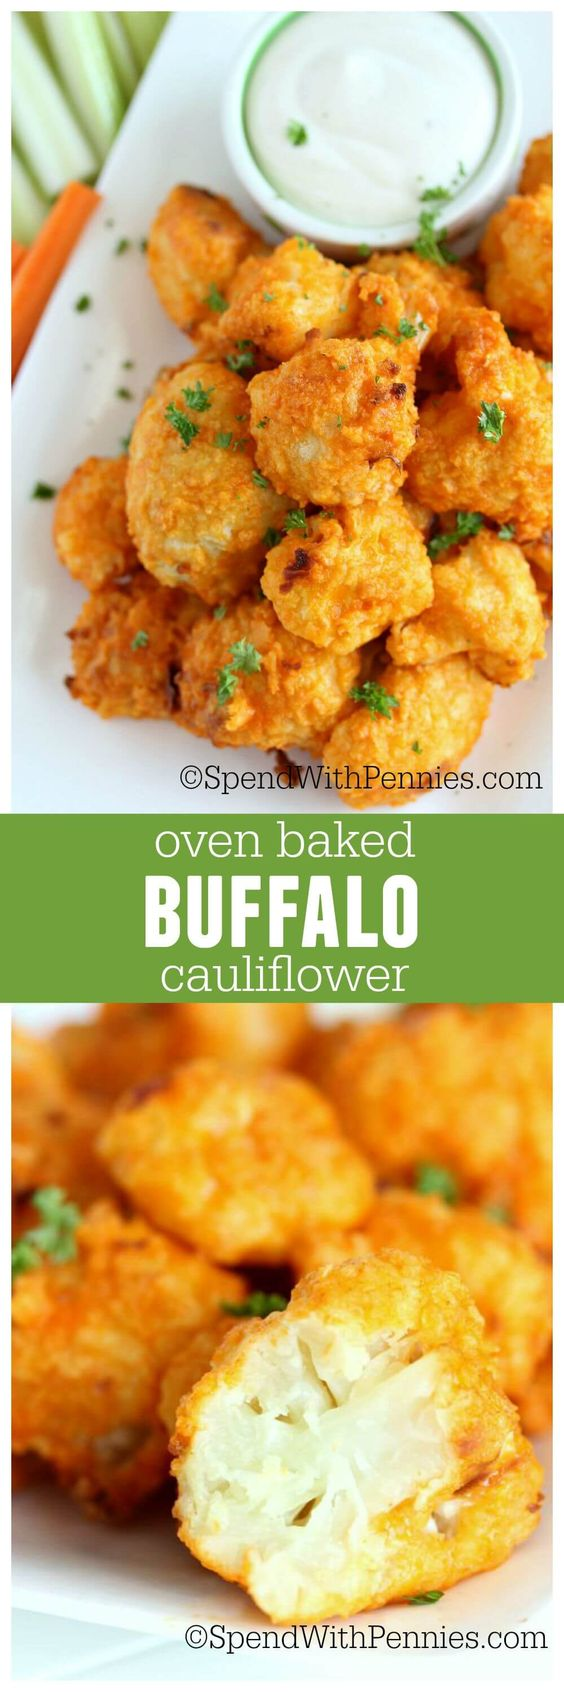 Oven Baked Buffalo Cauliflower